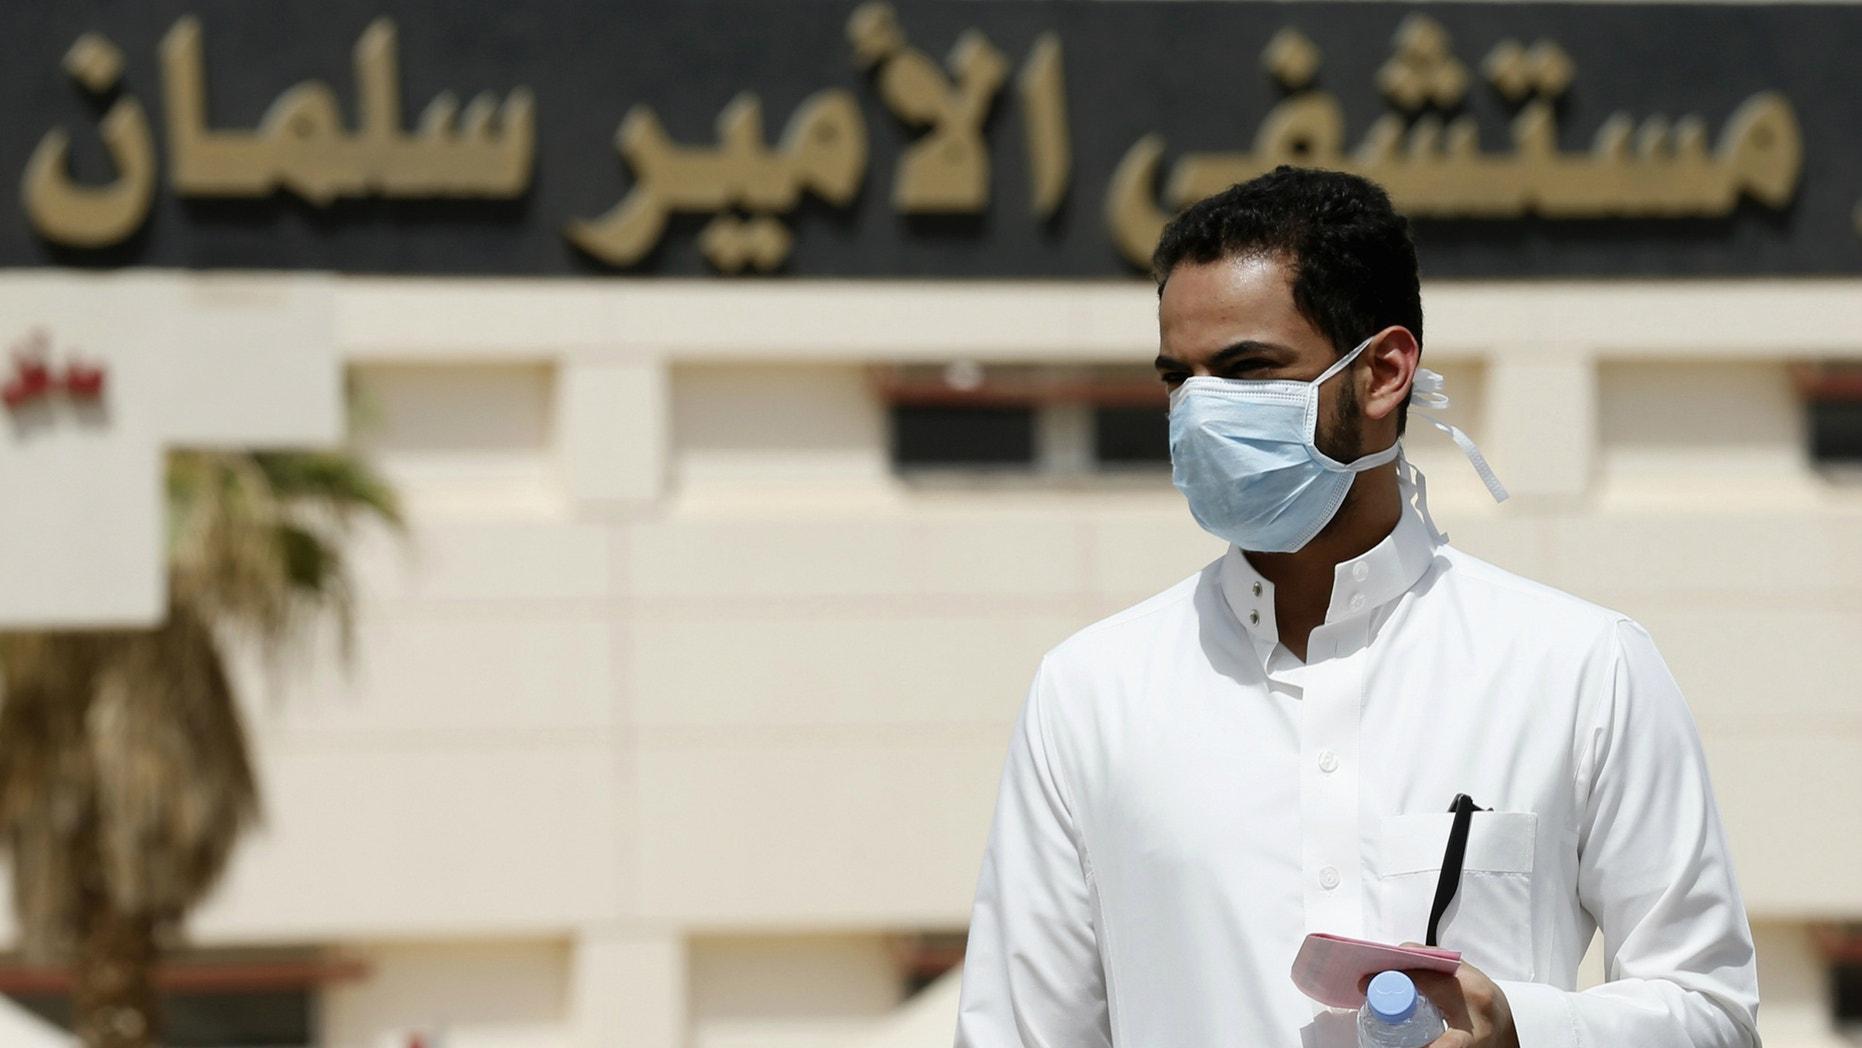 A man wearing a mask walks outside Prince Salman bin Abdulaziz hospital, in Riyadh.